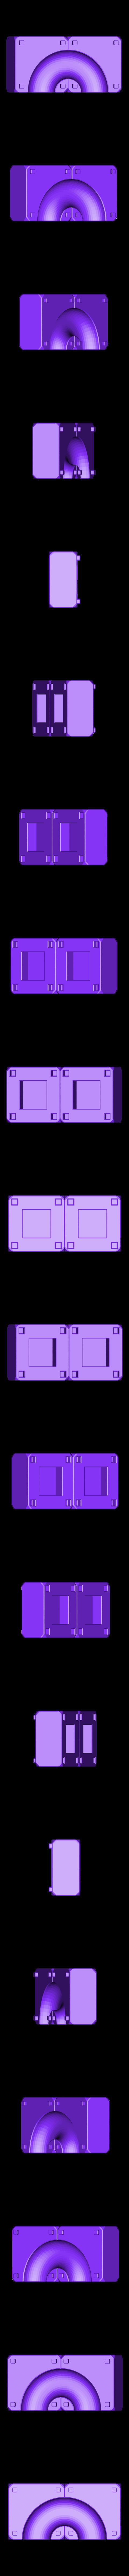 MarbleRunBlocks-CornerDouble.stl Download STL file Marble Run Blocks - Extension pack • 3D printing design, Wabby